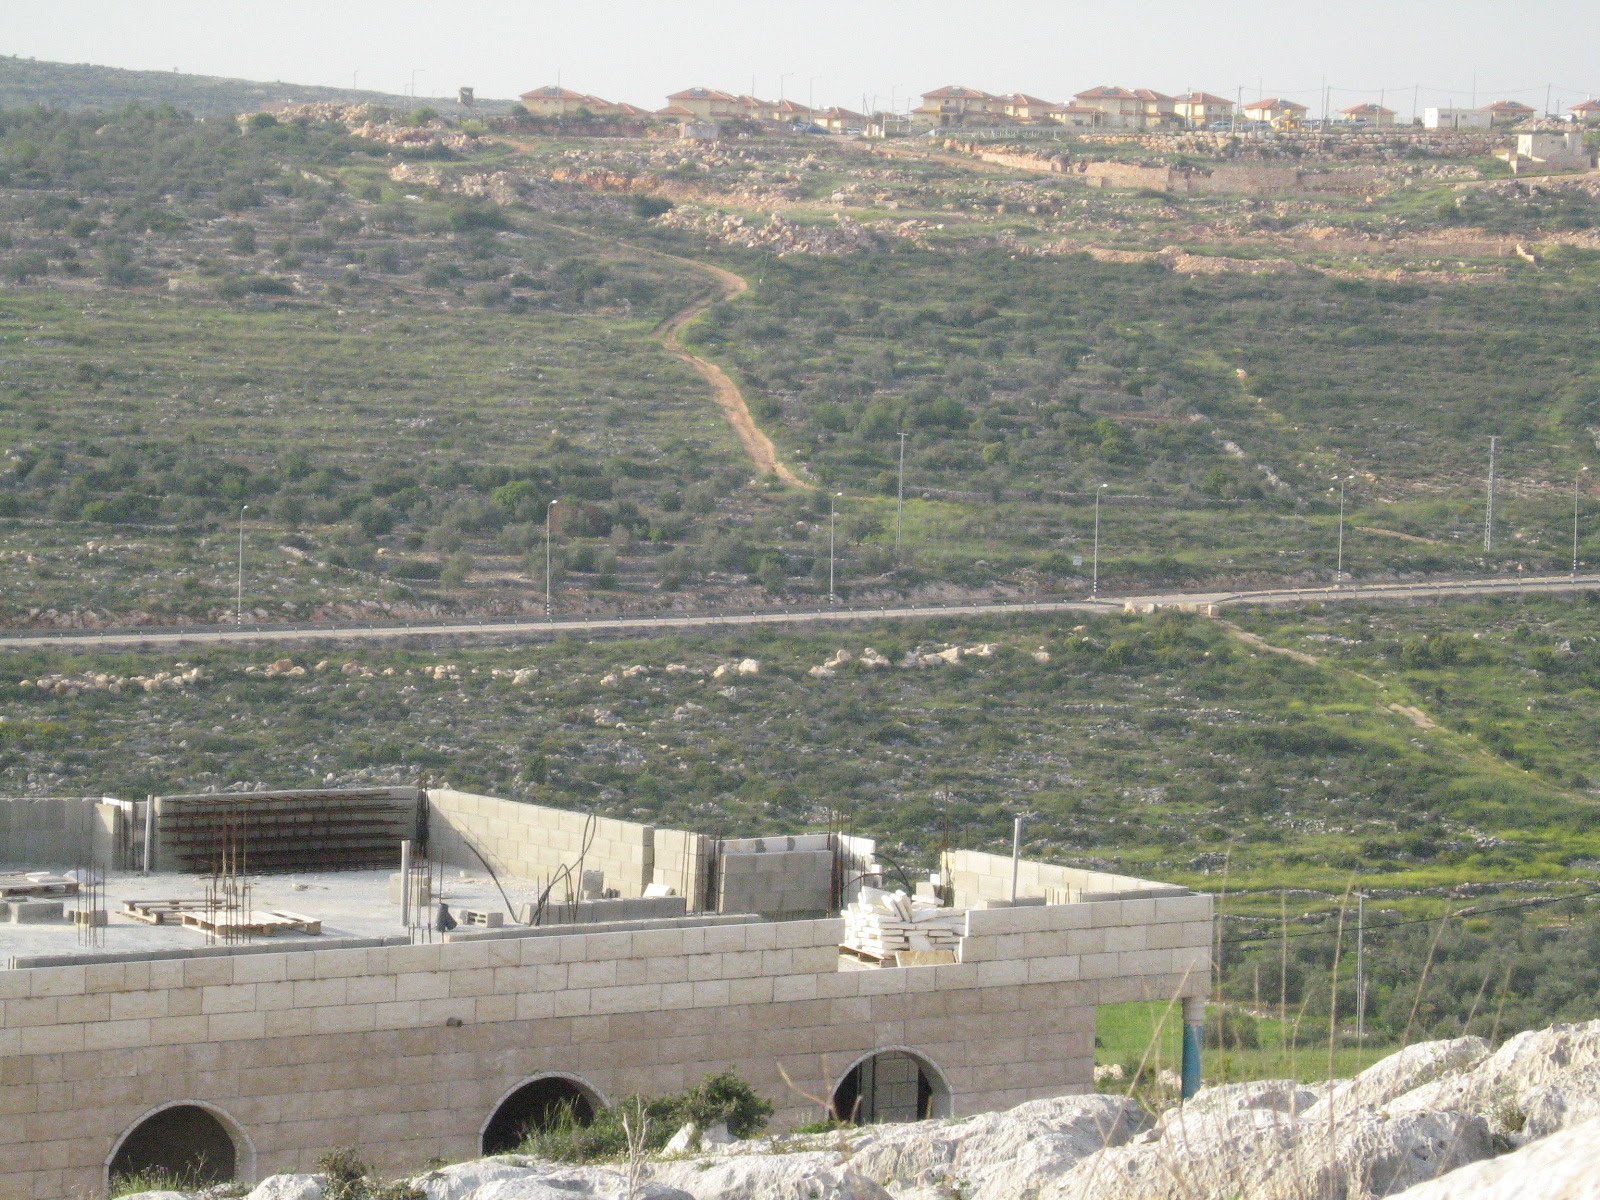 Kafr al-Dik-كفر الديك: شرق كفرالديك - مستوطنة برقين